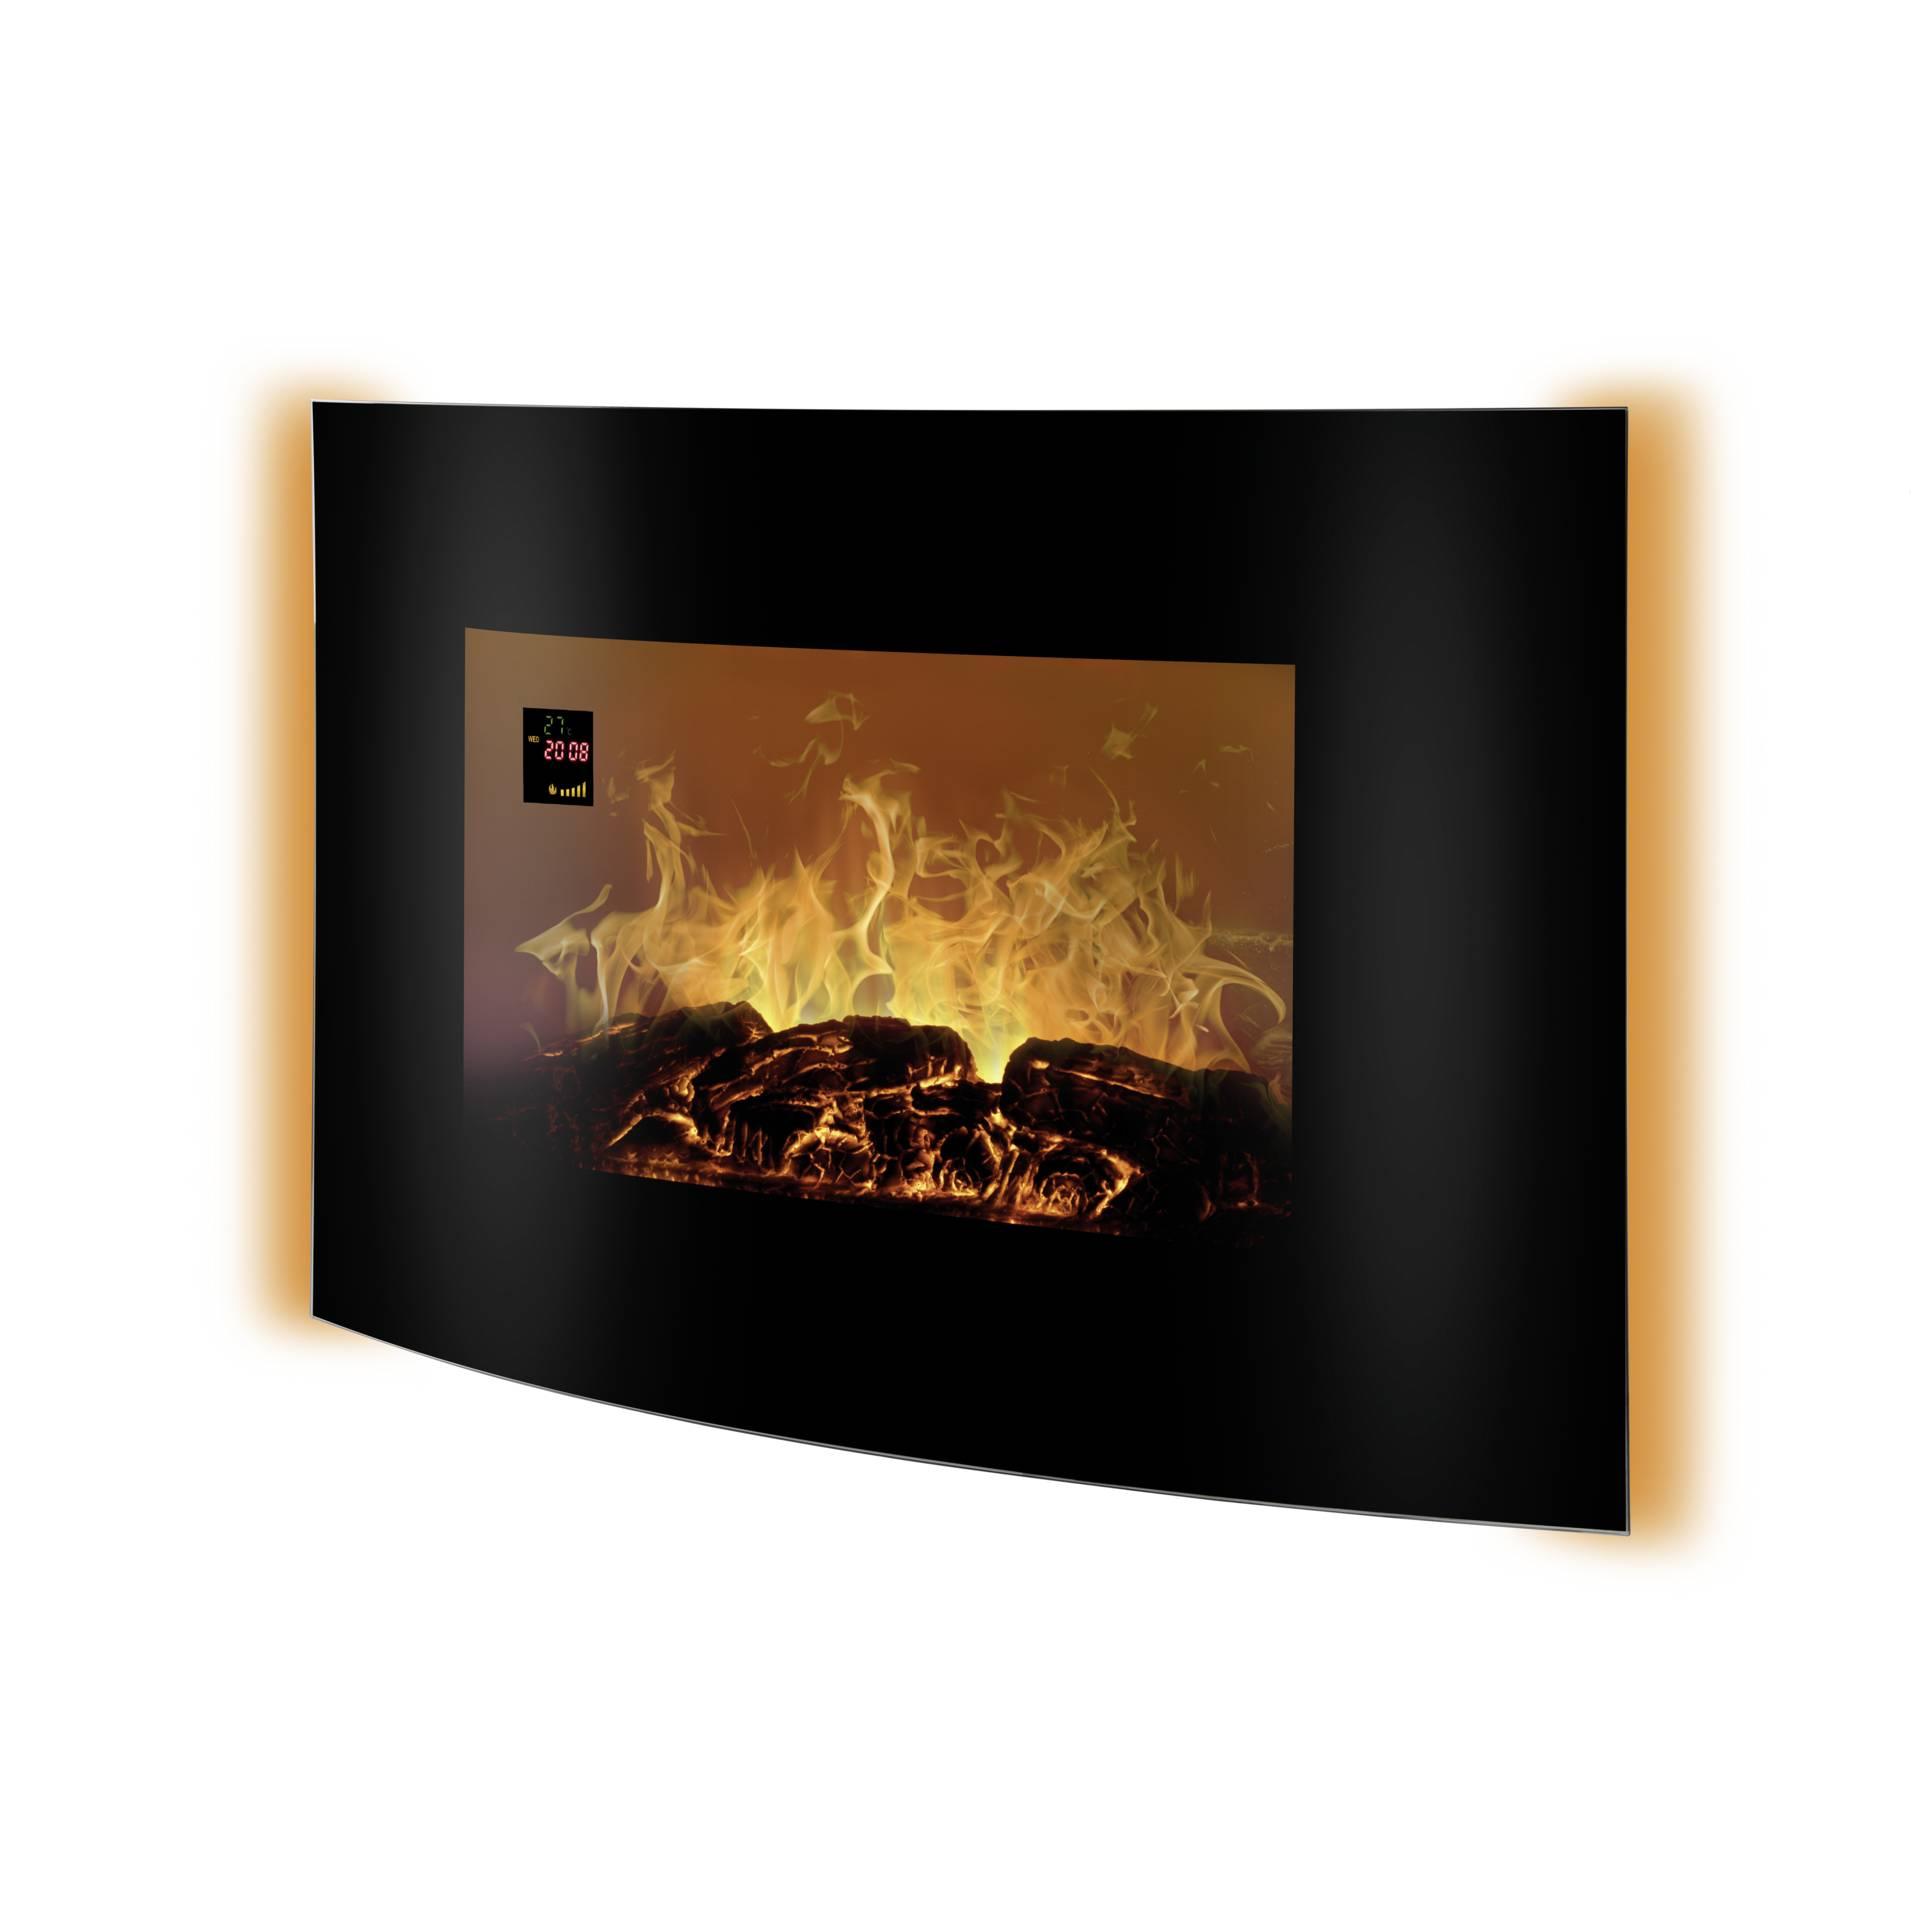 Clock Over Fireplace Lovely Bomann Ek 6021 Cb Black Electric Fireplace Heater